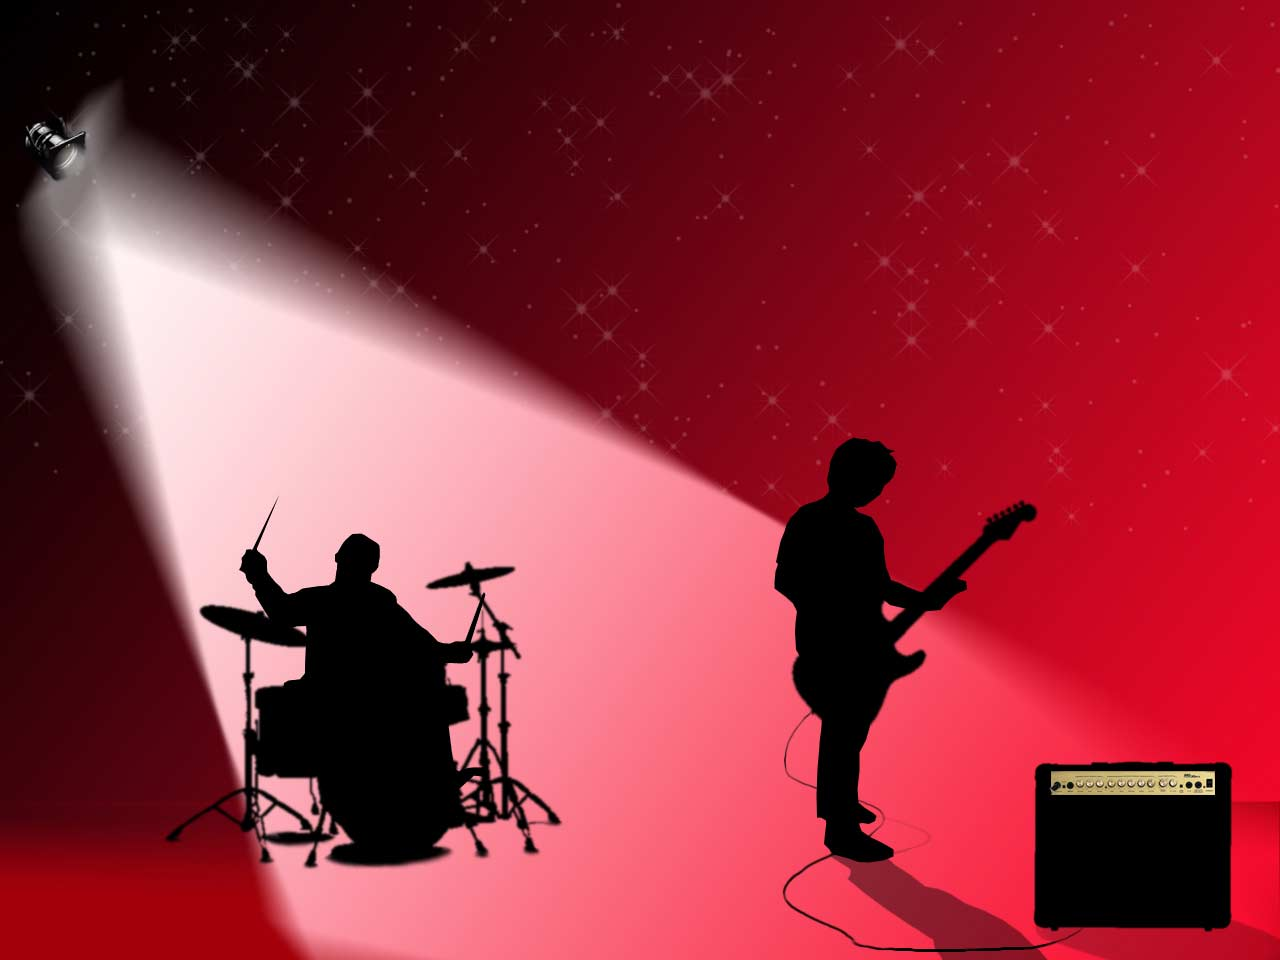 Fonds Ecran Musique